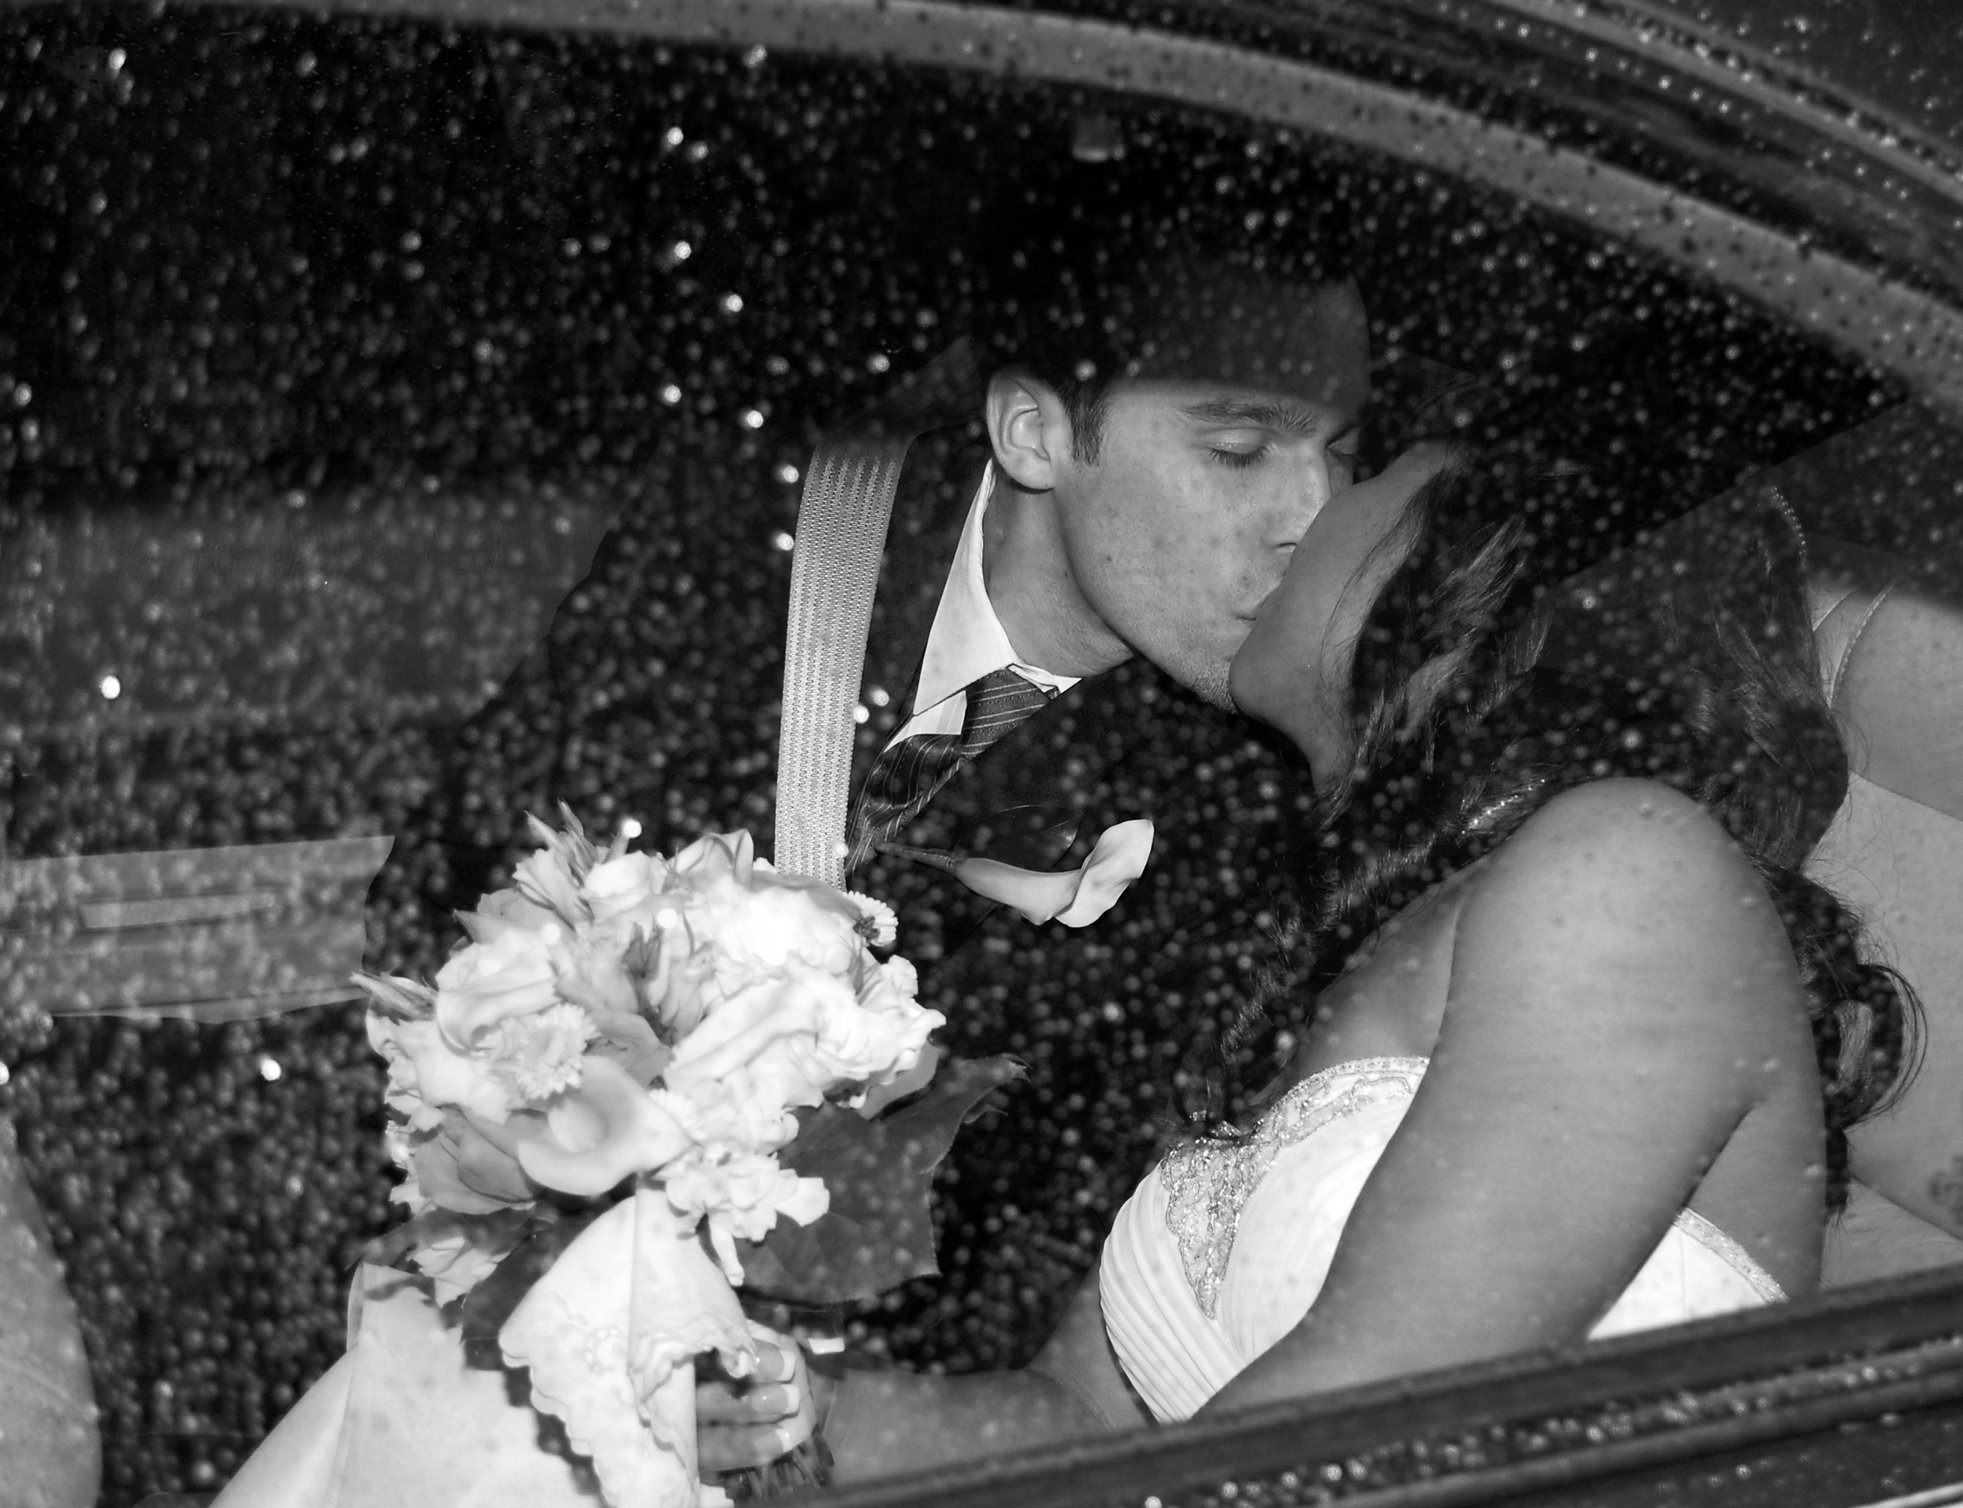 caines wedding.jpg